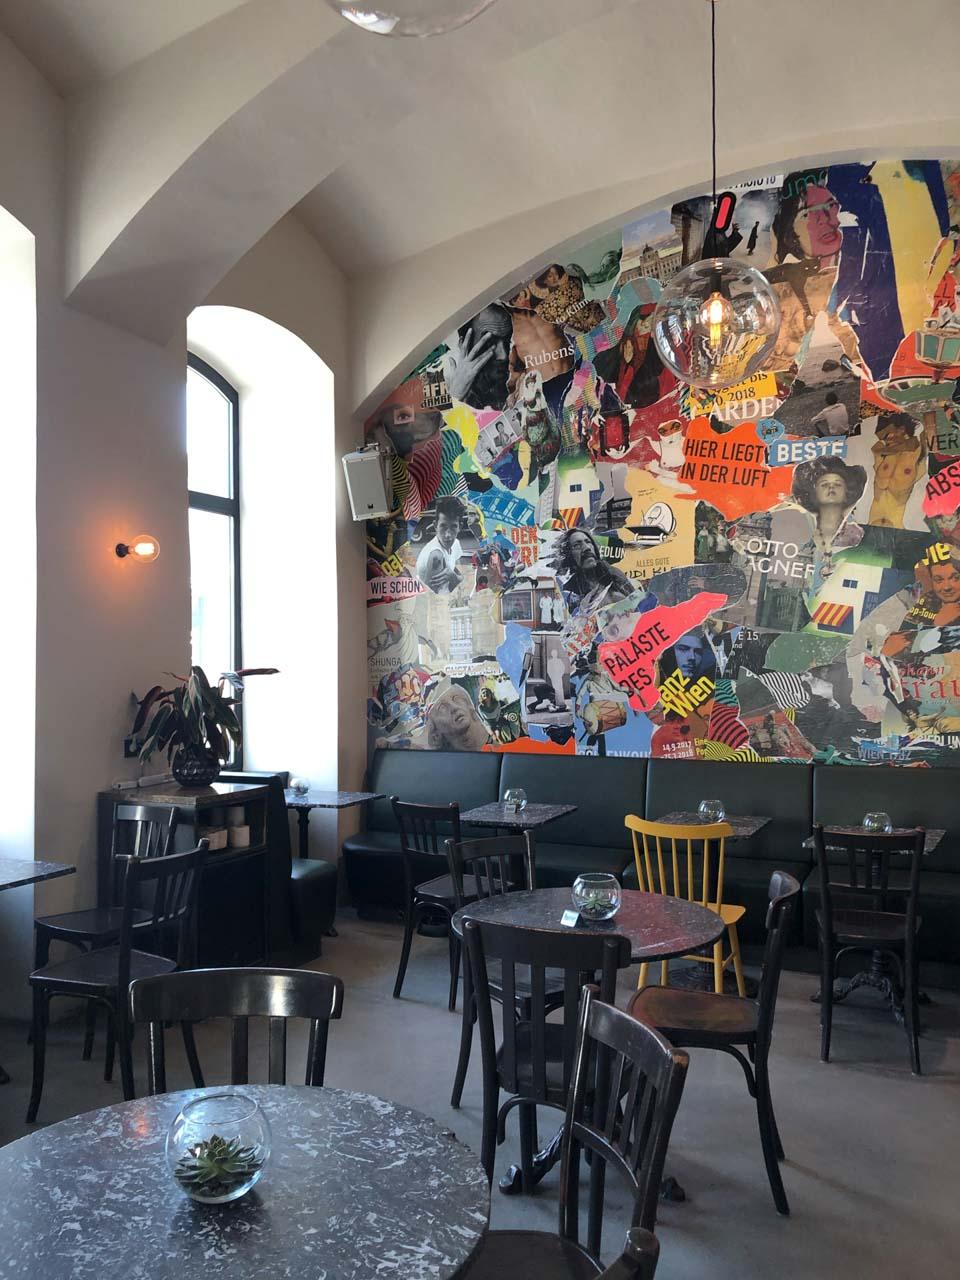 Wall art inside of Drechsler in Vienna, Austria